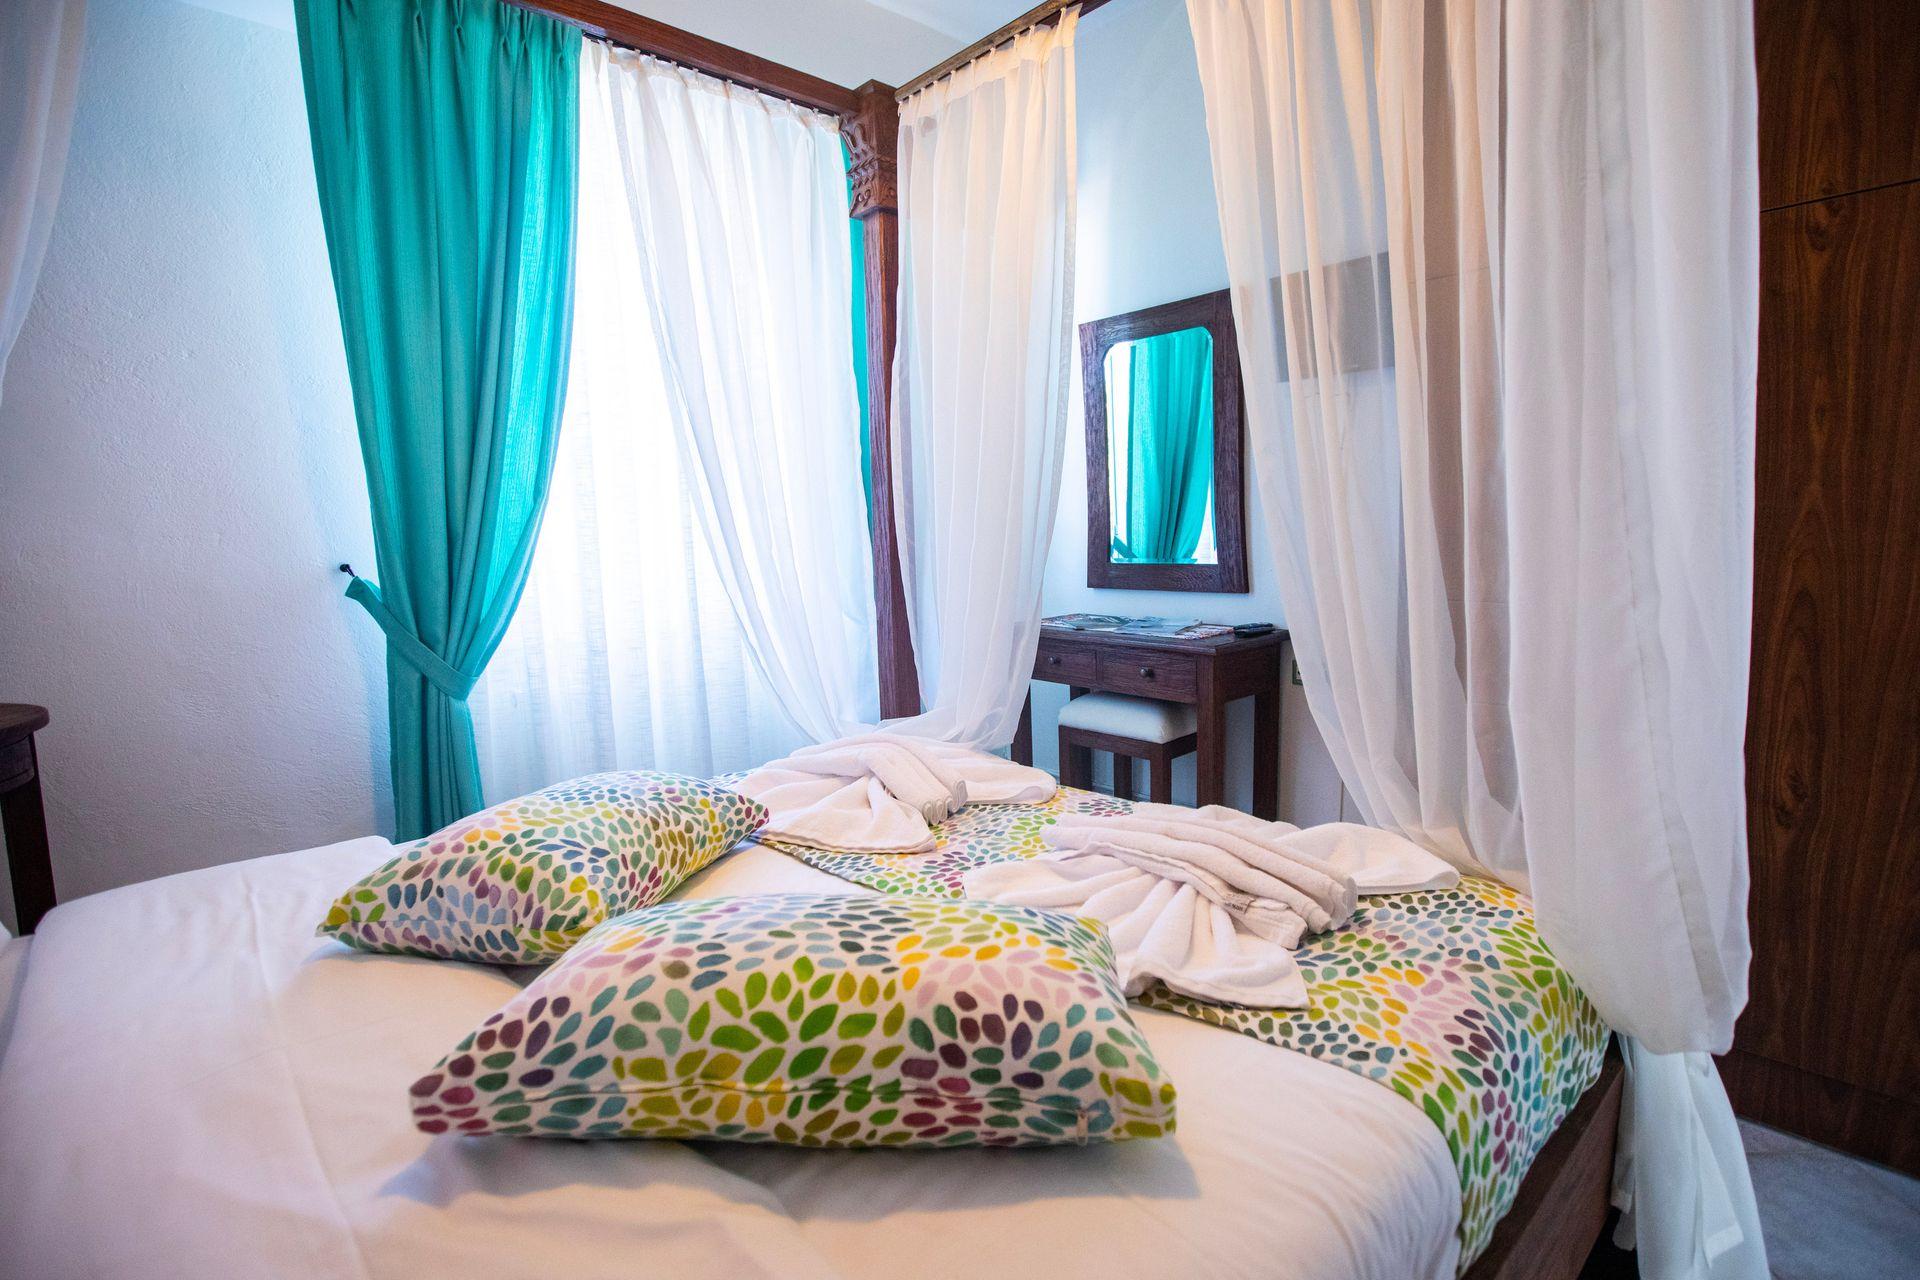 Kastro Apartments - Ρέθυμνο, Κρήτη ✦ -20% ✦ 3 Ημέρες (2 Διανυκτερεύσεις) ✦ 4 άτομα ✦ Πρωινό ✦ έως 29/09/2020 ✦ Free WiFi